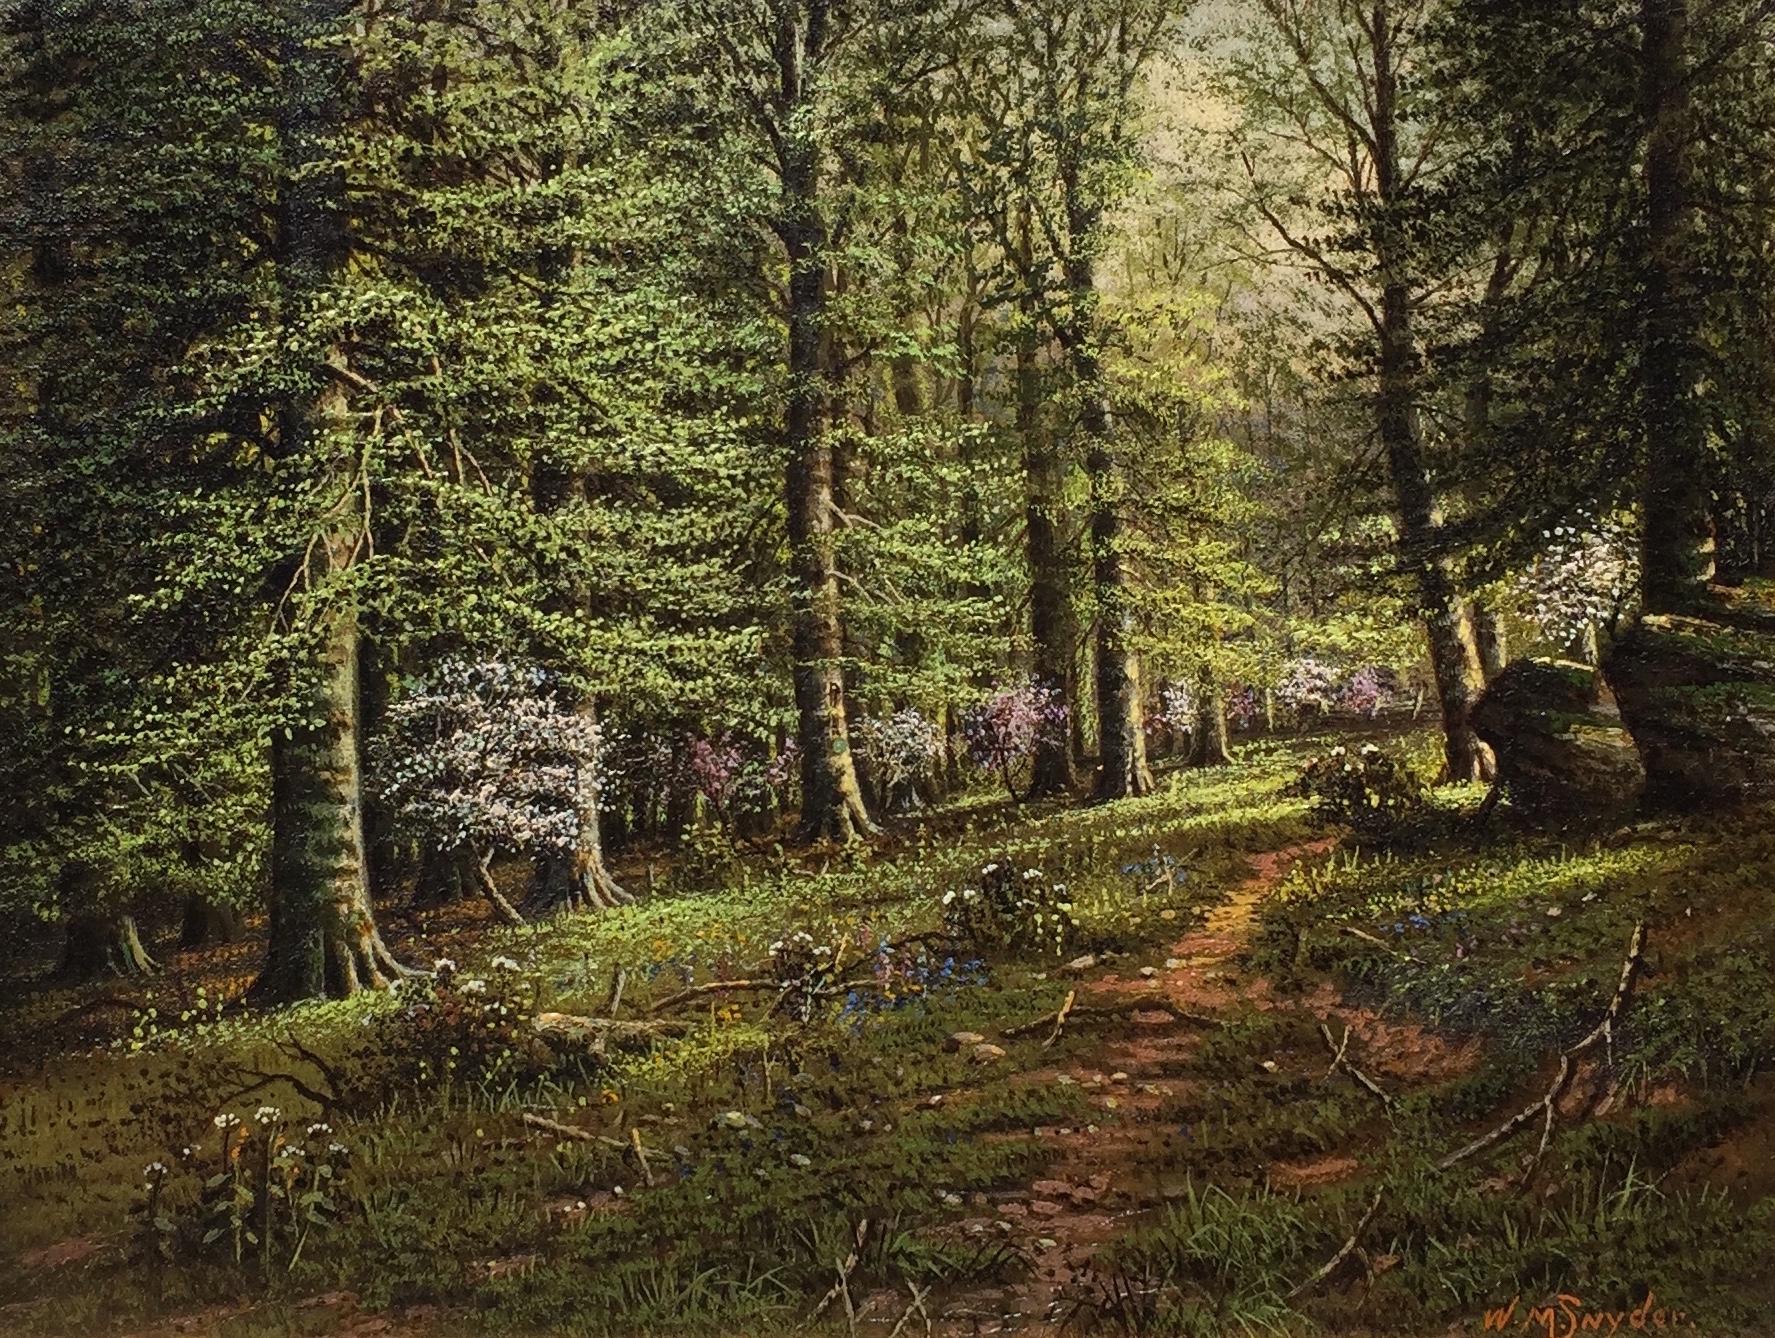 snyder-springinthebeechwoods-cropped